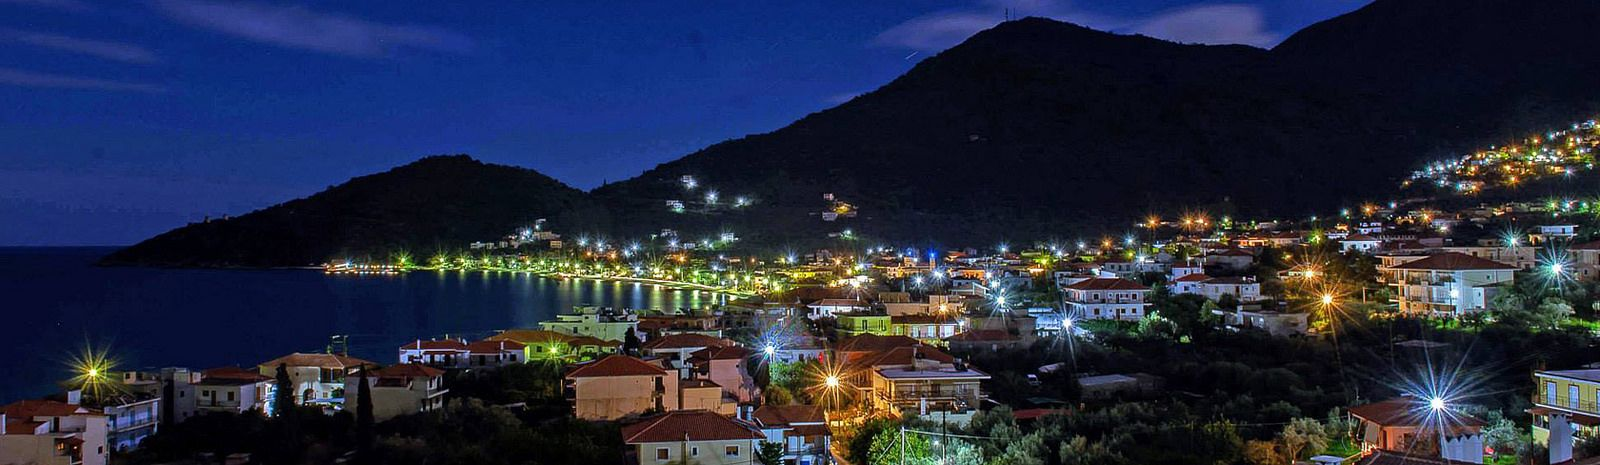 https://flic.kr/p/rmZV63 | Tyros Peloponnese Greece | A beautiful night view from Tyros Greece. www.hotel-paraskevas.com/en/